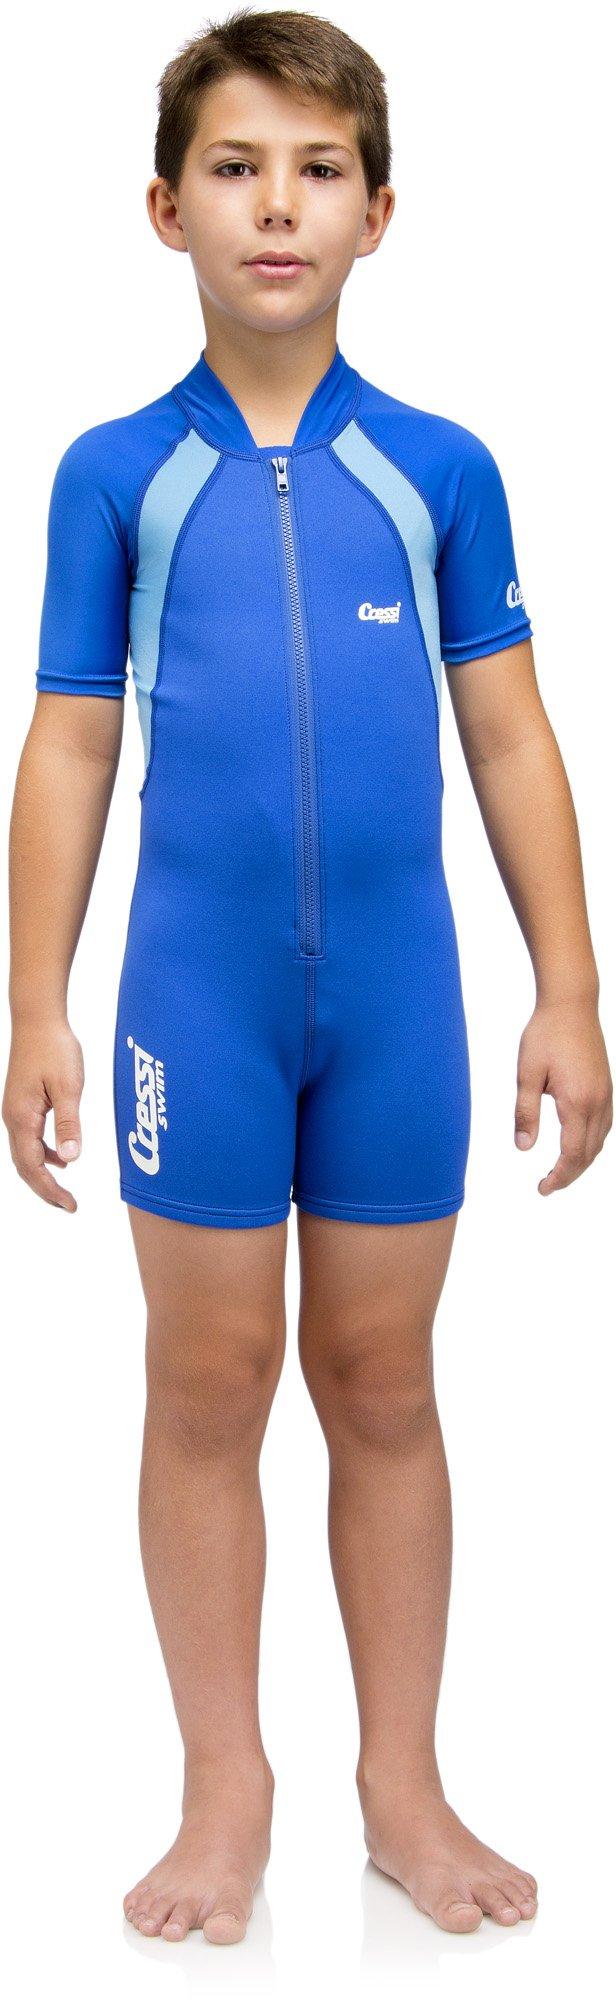 Cressi Unisex Wetsuit Neoprene, Traje de Buceo 1.5 mm para Niños, Azul (Blue/Blue Light), 6-8 Años (Talla fabricante: XL)